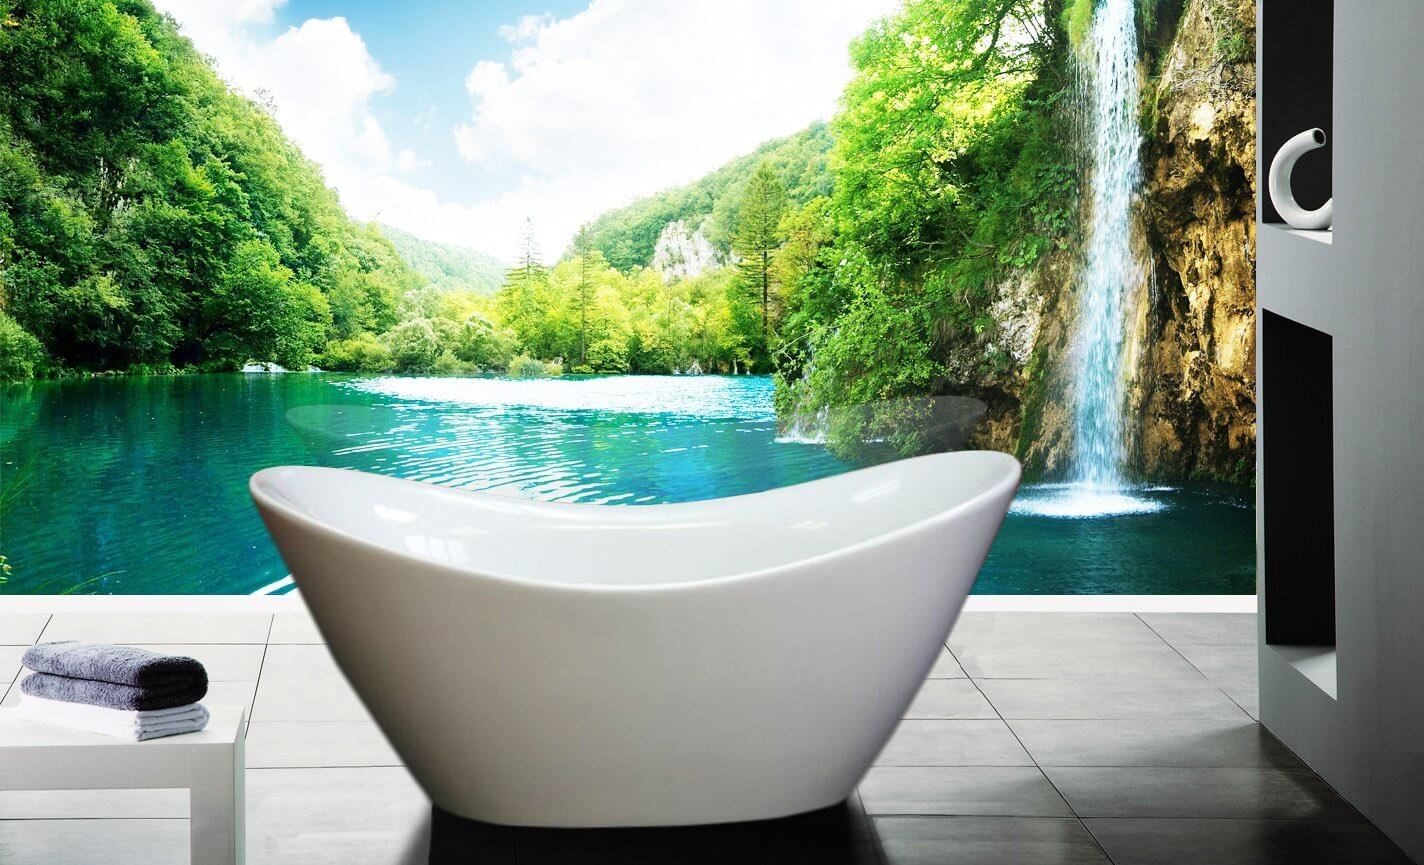 AKDY F210 Bathroom White Color Free Standing Acrylic Bathtub